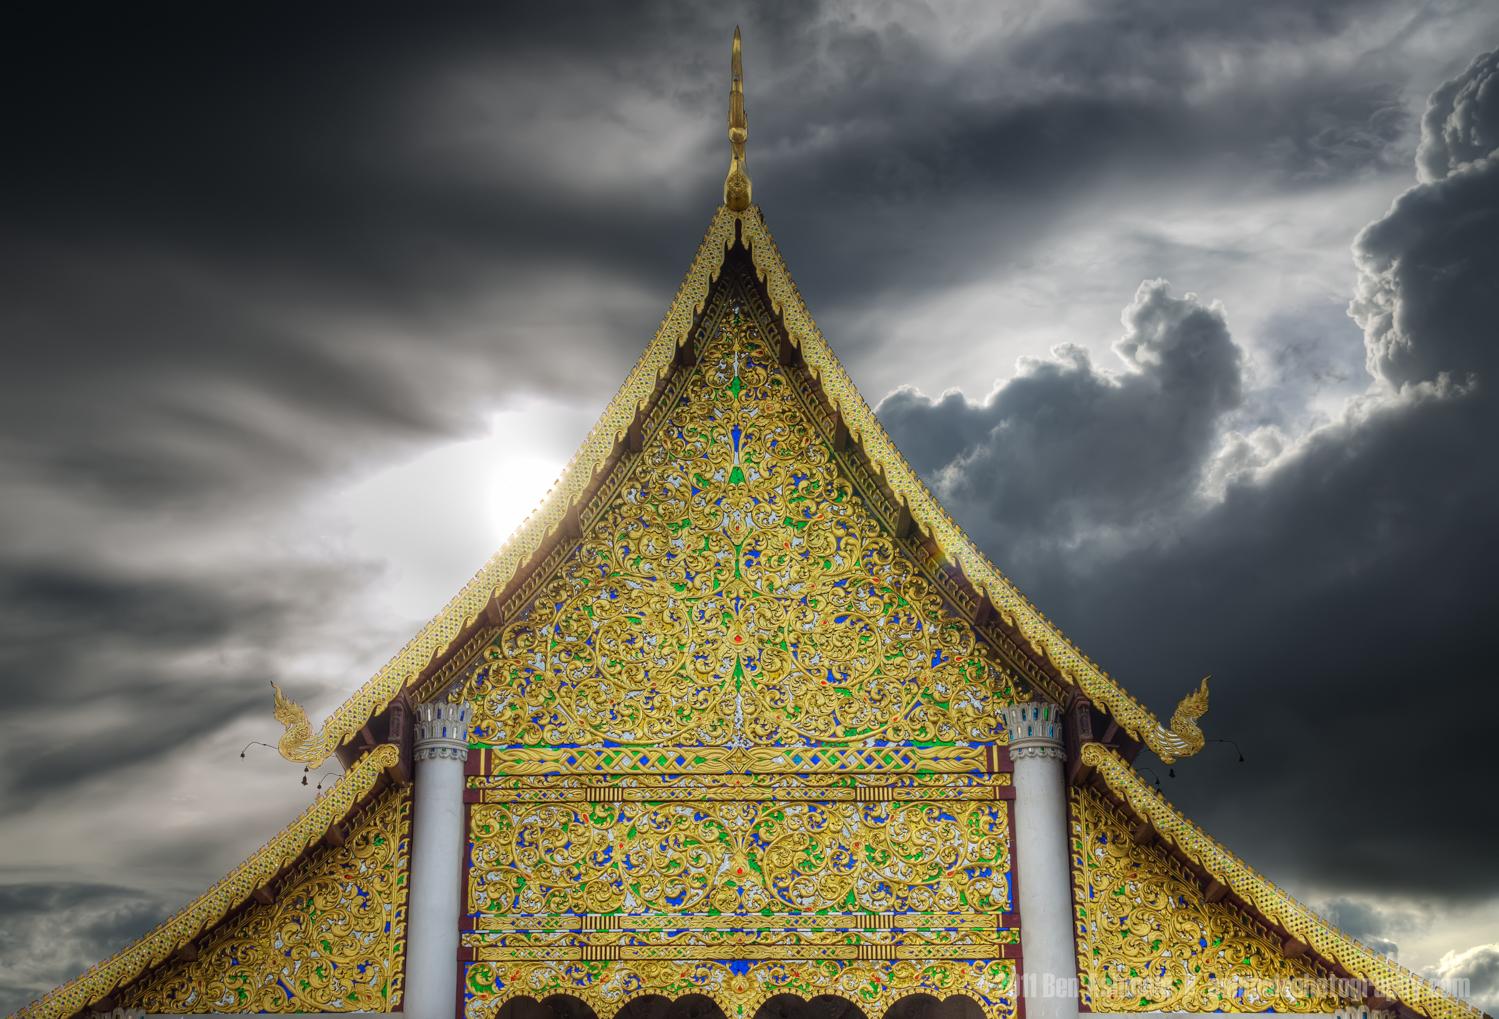 The Temple Roof, Chiang Mai, Thailand, Ben Ashmole